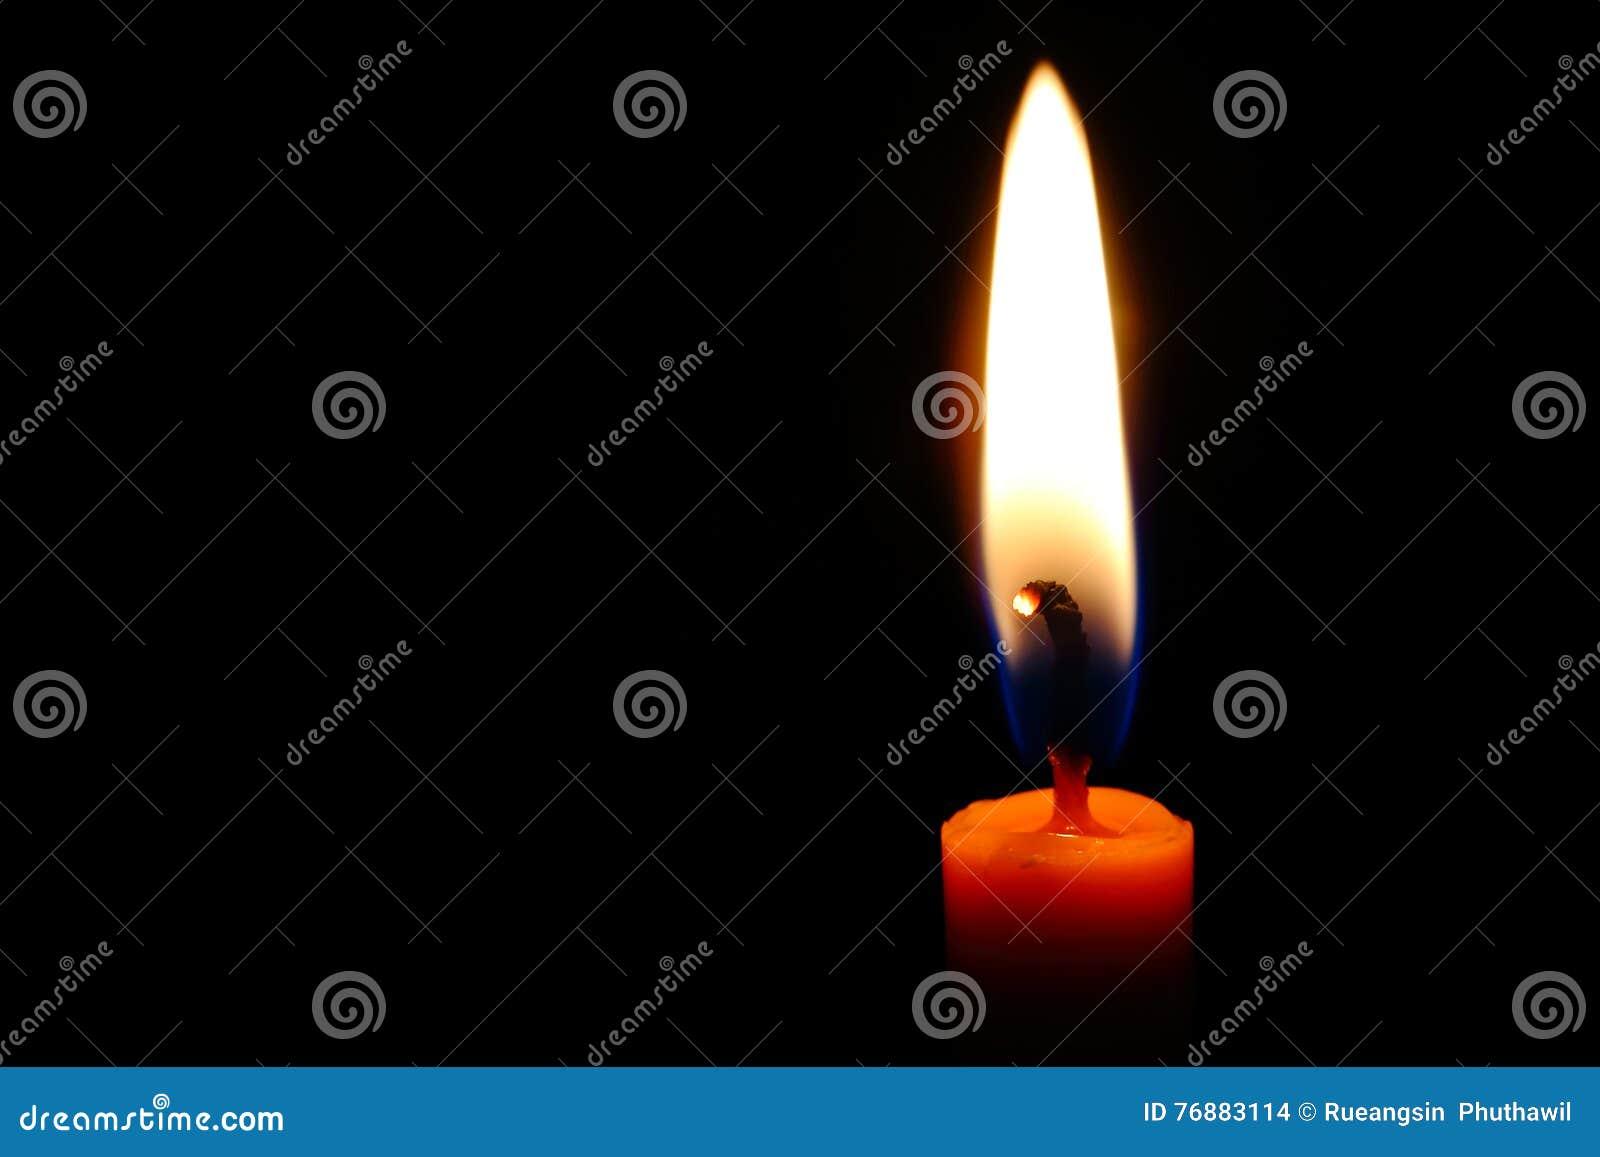 flamme de bougie photo stock image du orange lueur 76883114. Black Bedroom Furniture Sets. Home Design Ideas